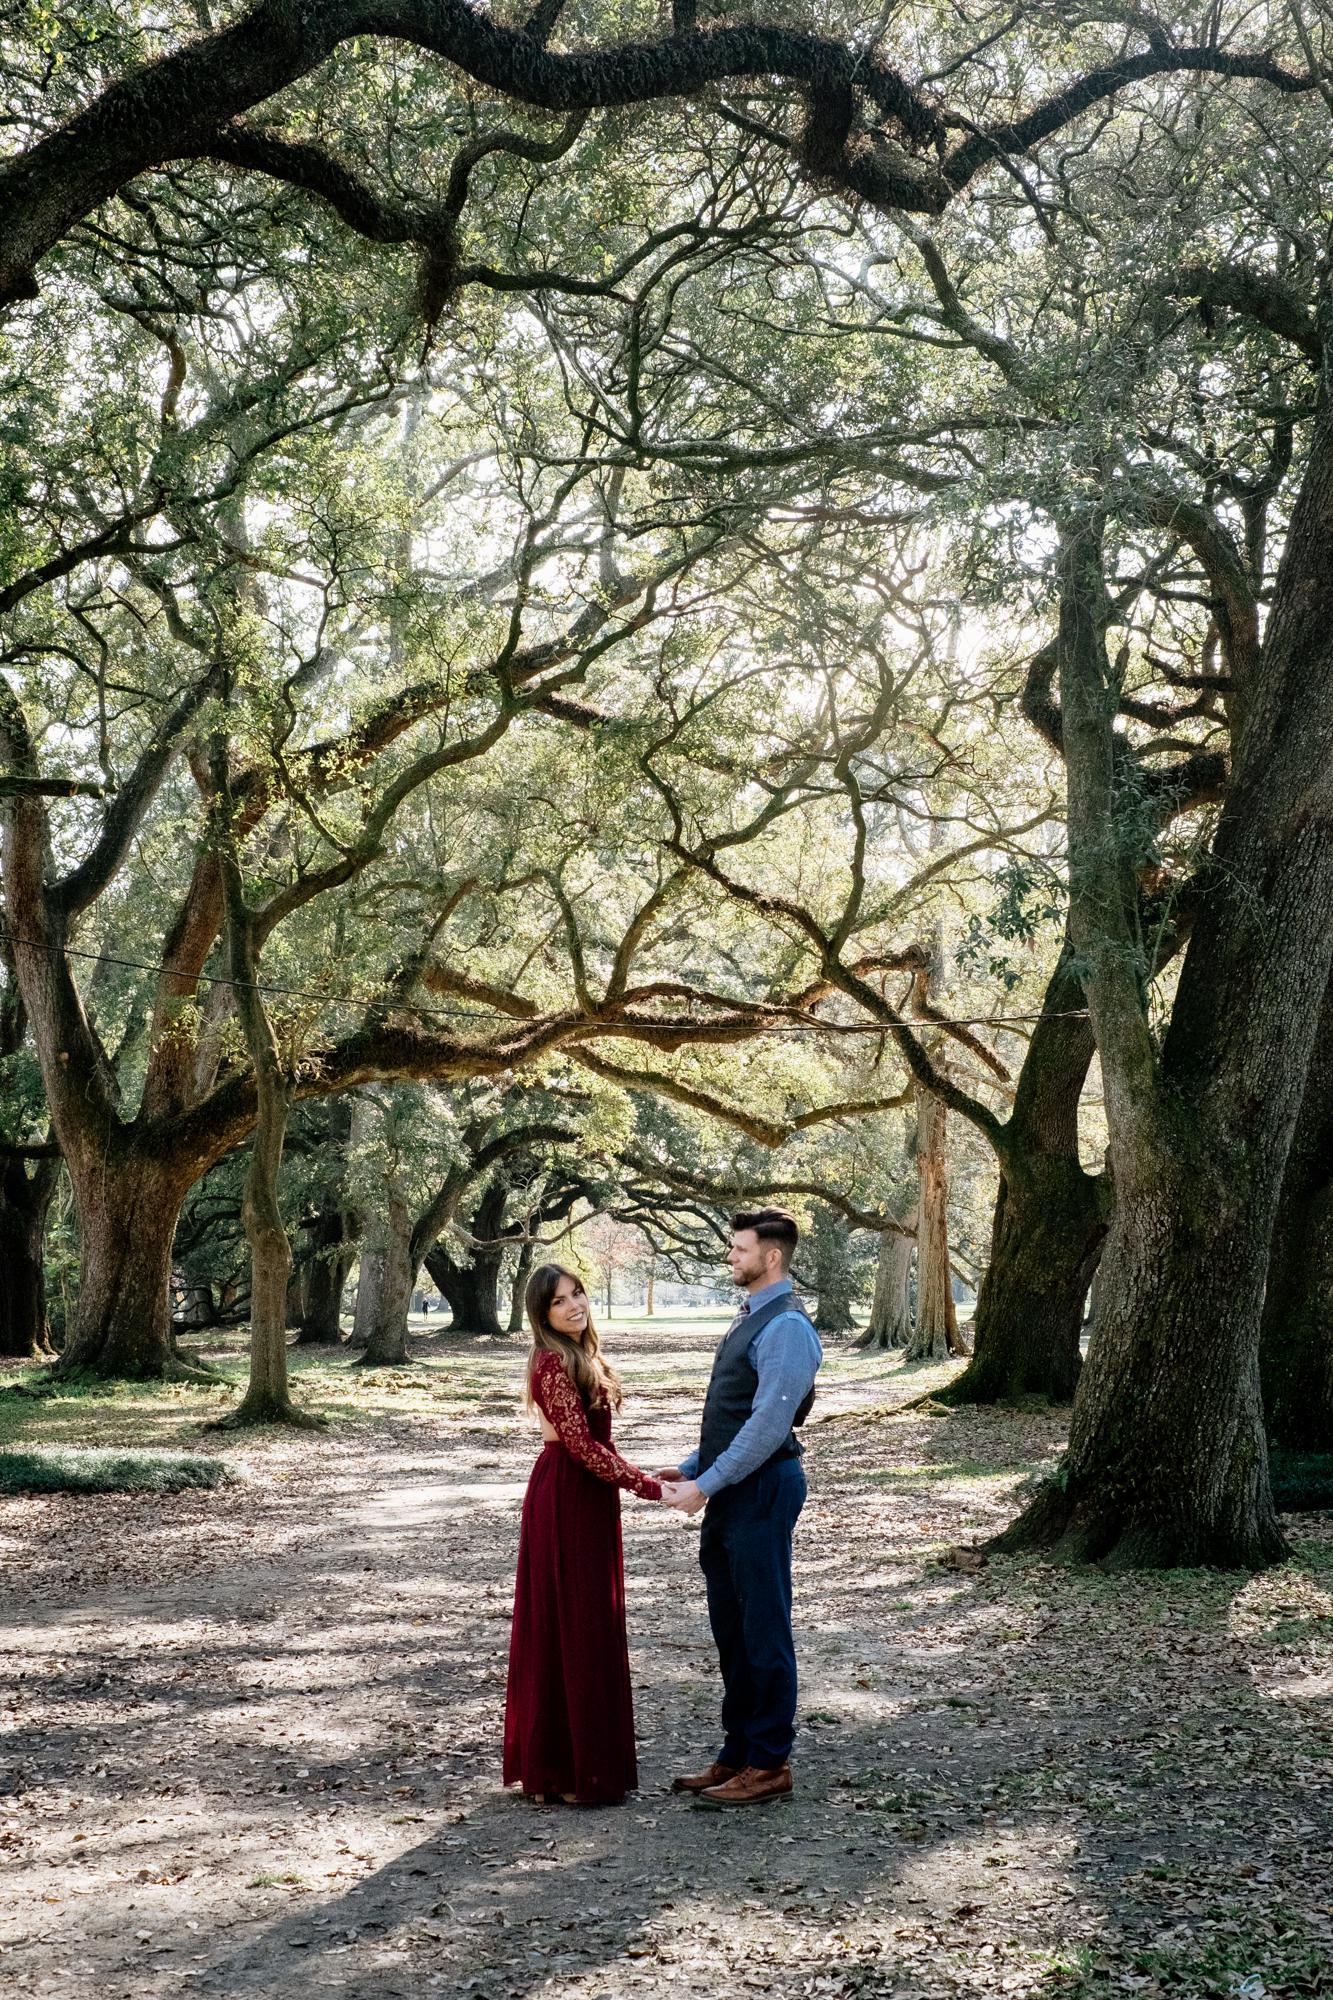 Jen_Montgomery_Photography_Angela_Brian_Engagement_Proposal_FB-187.jpg